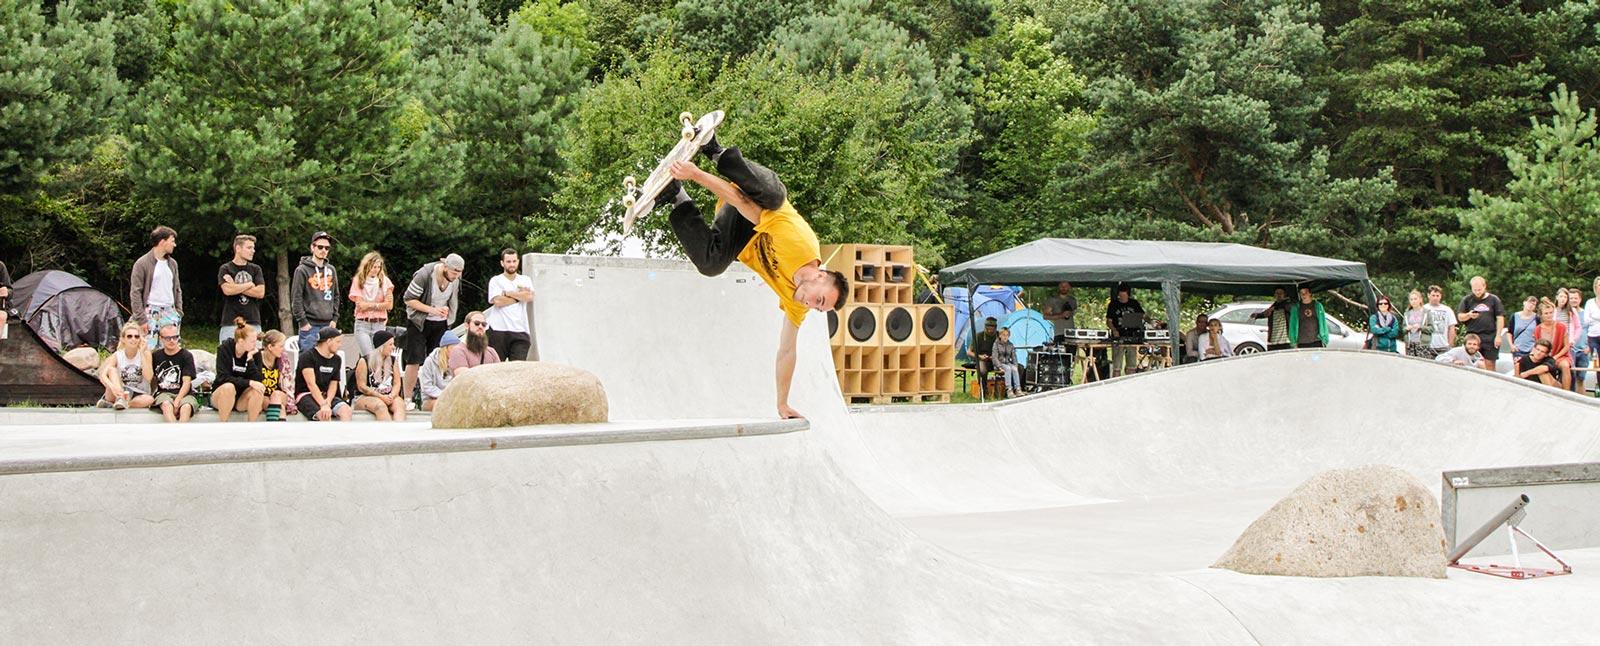 slider_start_ruegen_skateboarden_24